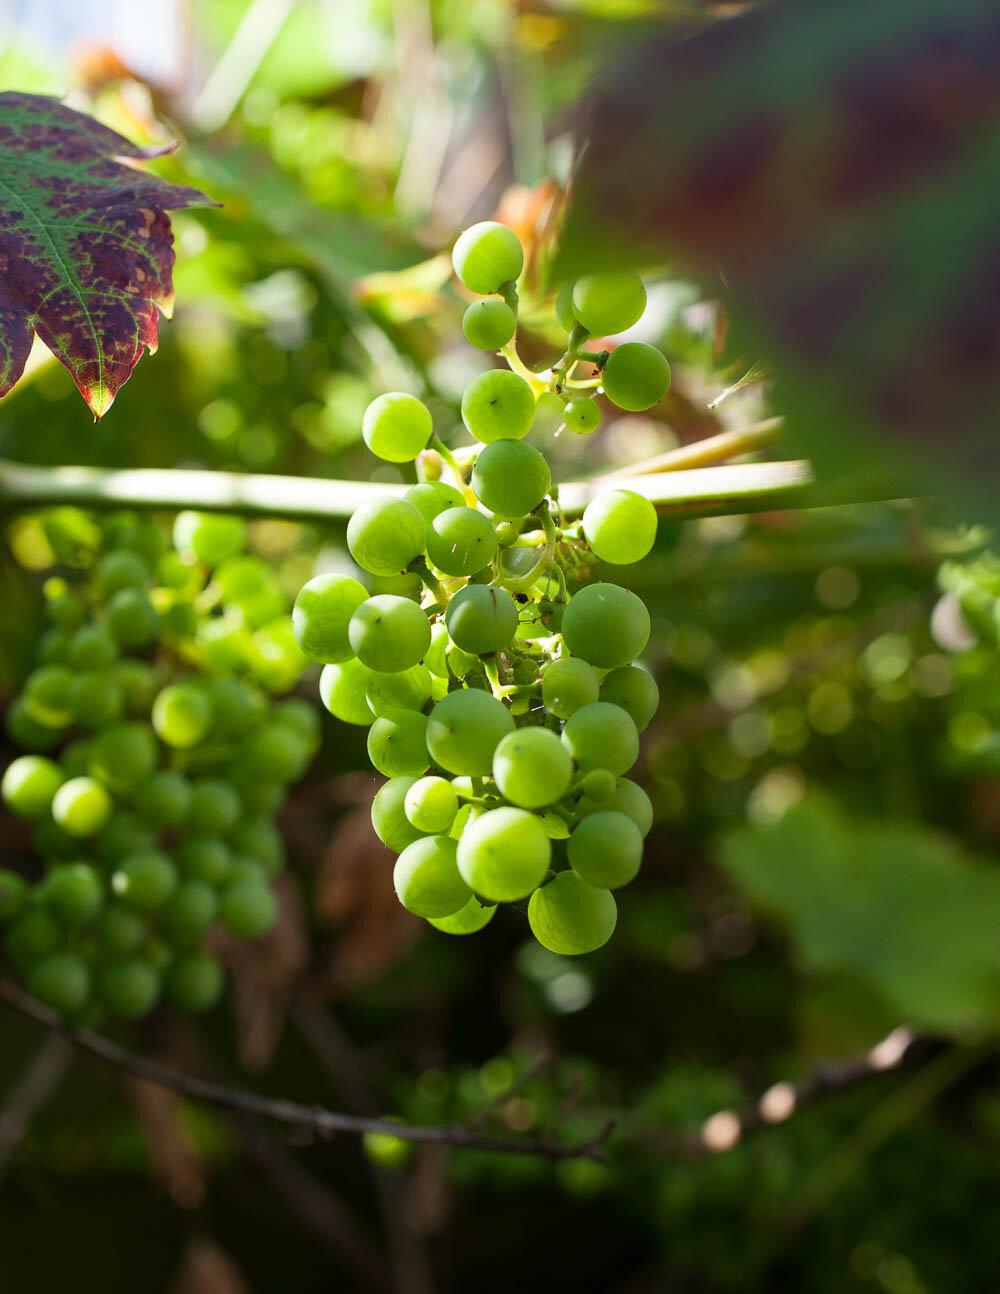 emmatsrobinson-fieldtofork-grapevine20190725-_MG_5701.jpg